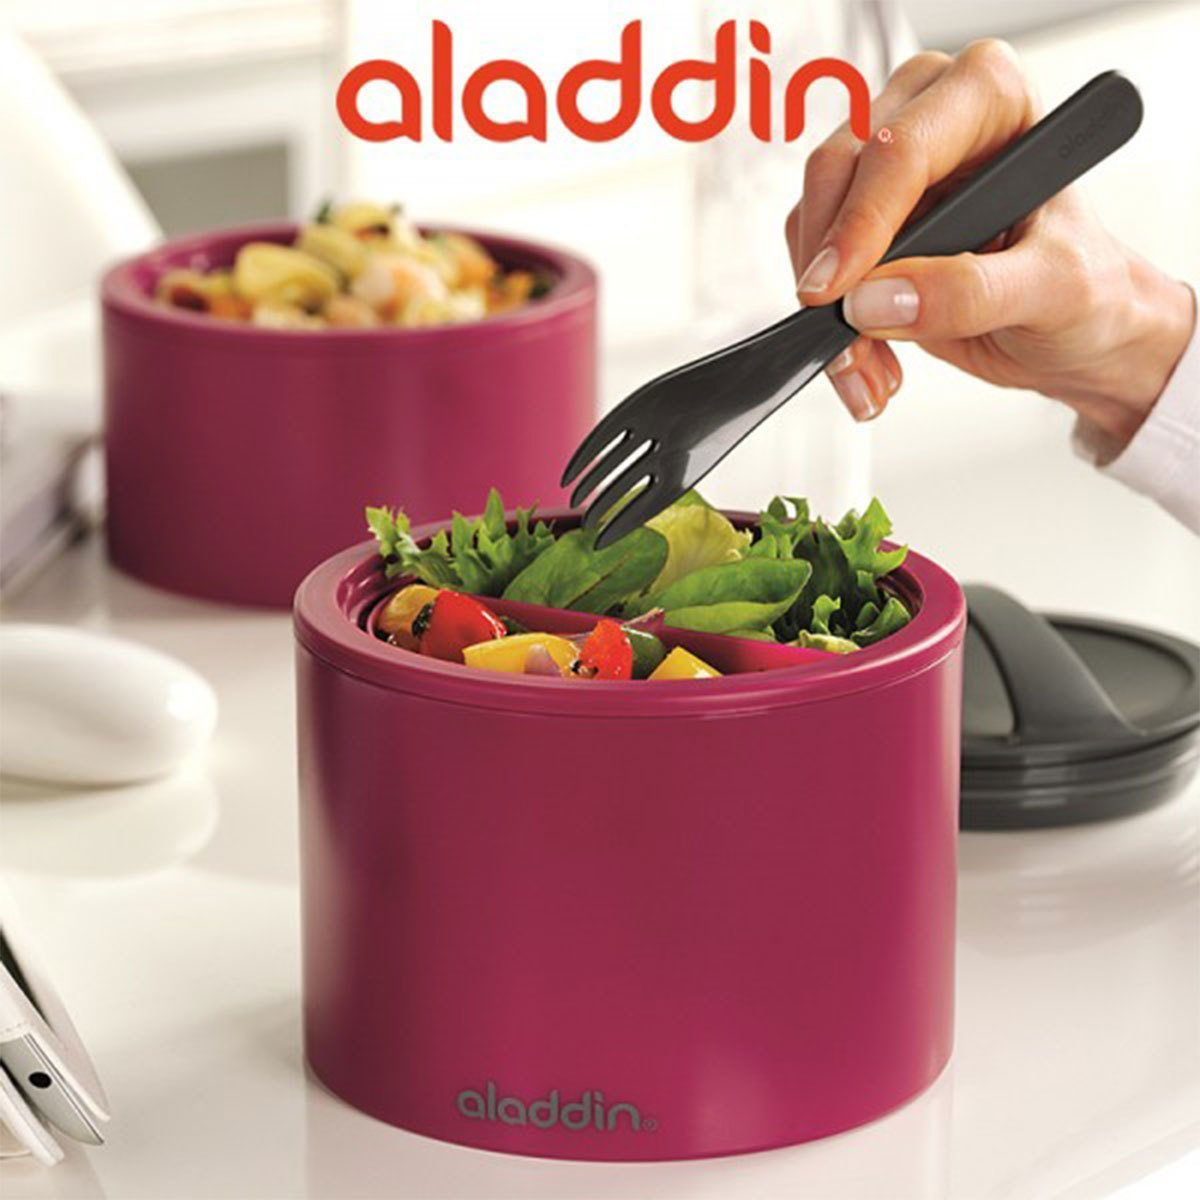 aladdin Aladdin Bento Lunchbox 0.95l, berry